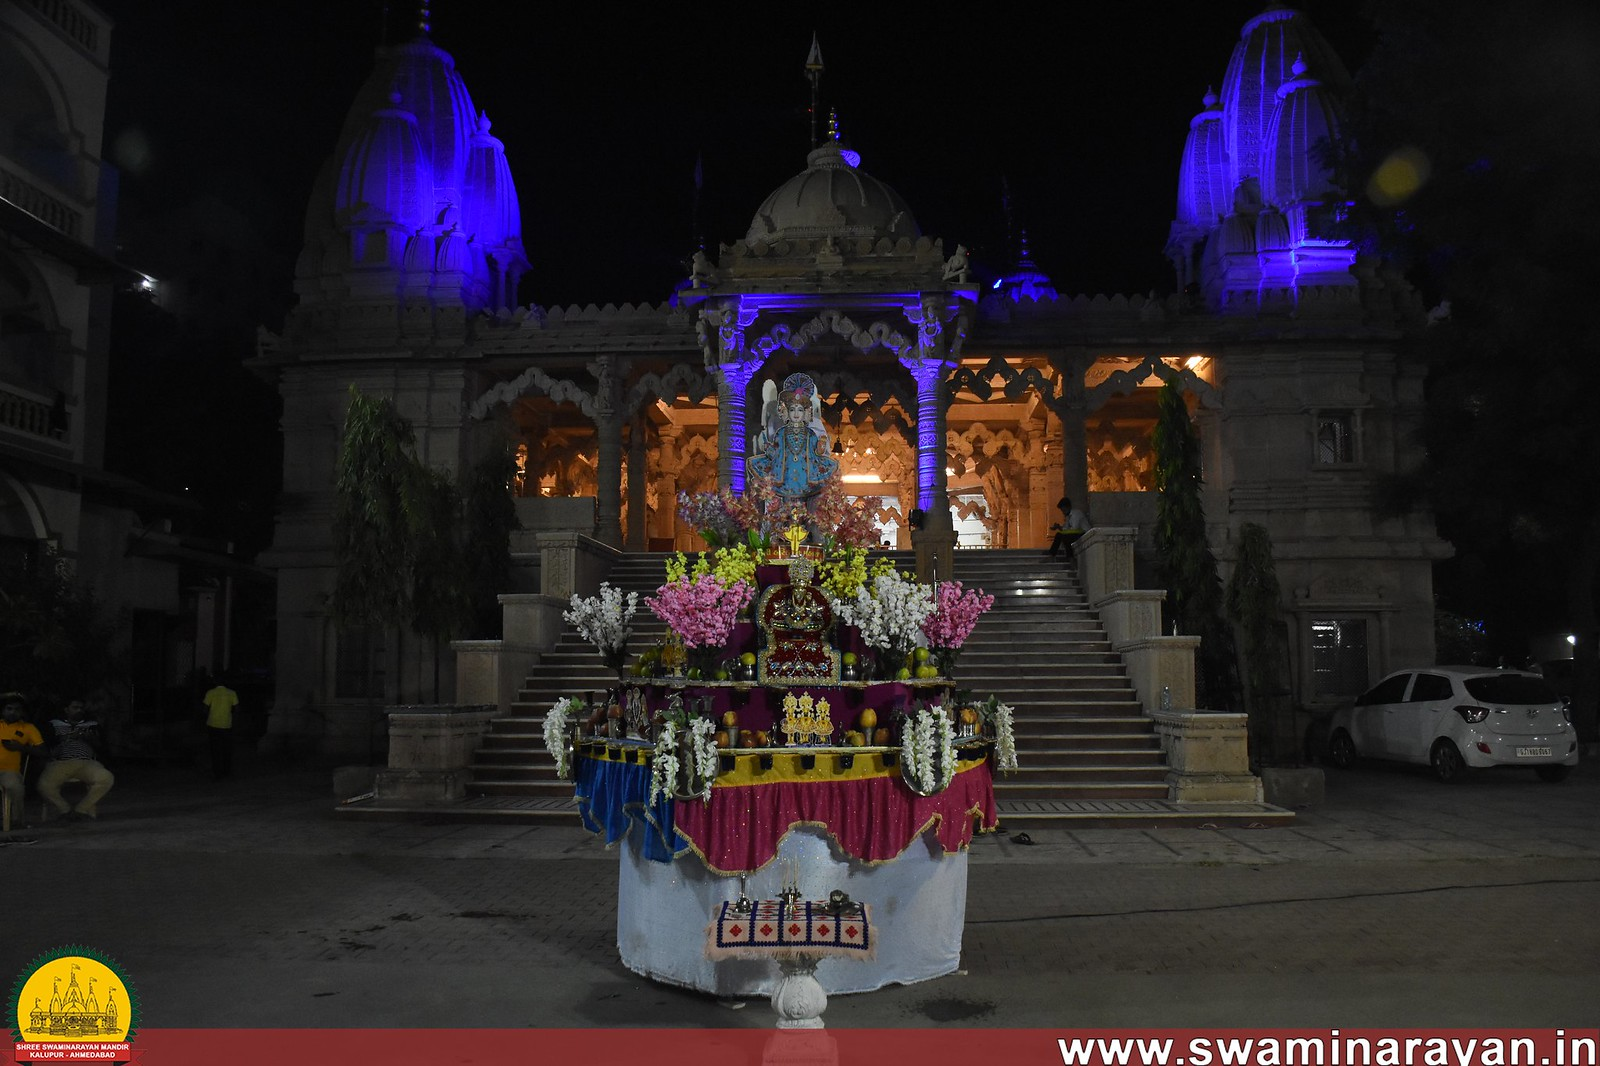 Sharad Poonam - Narayanghat